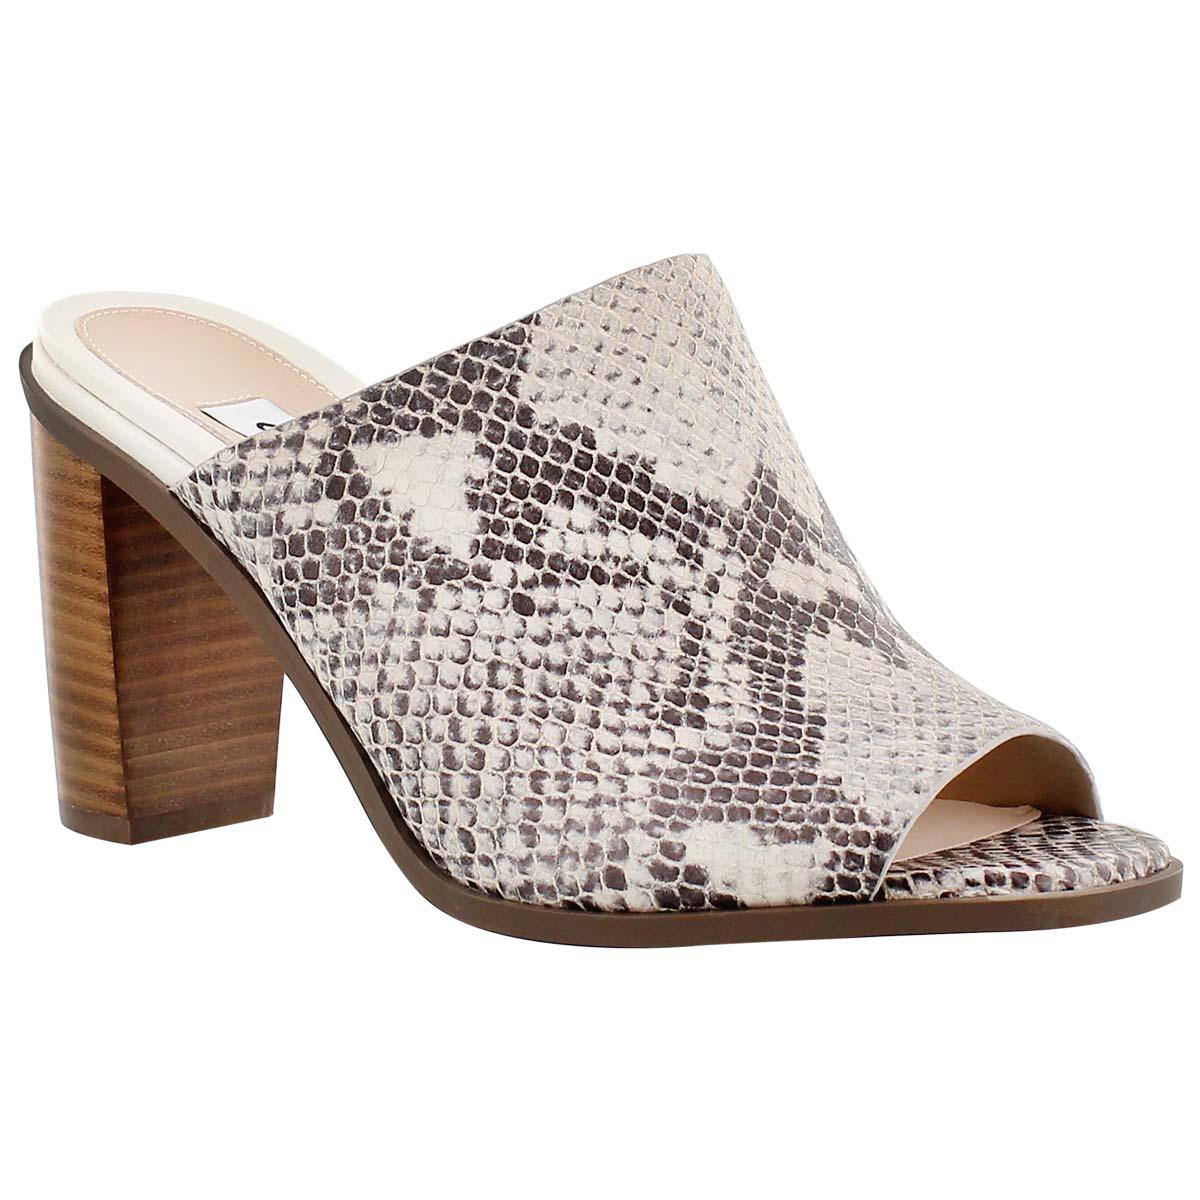 Lds Image Gallery natural dress sandal